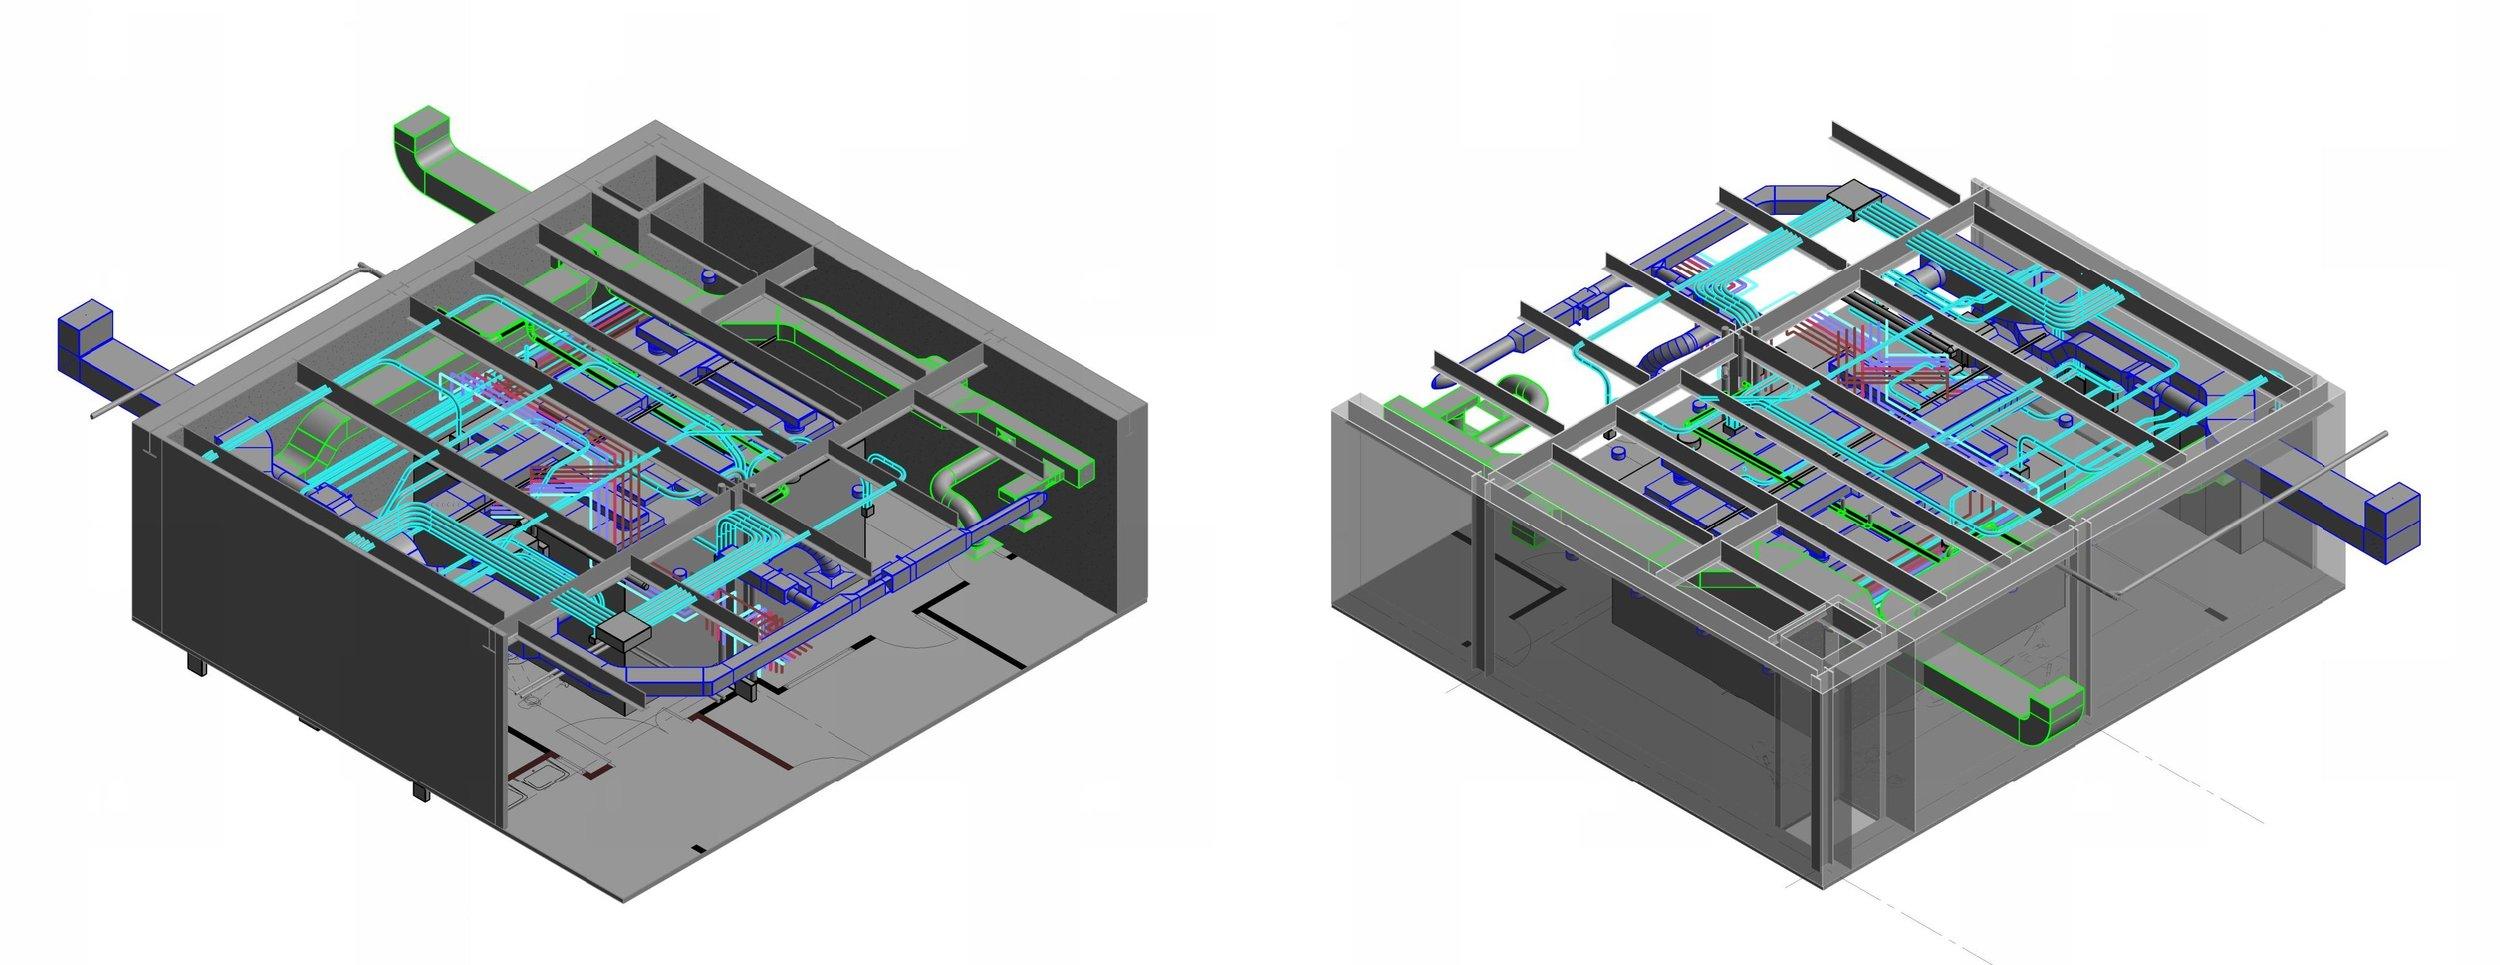 MEP-500 - ISOMETRIC VIEWS.jpg